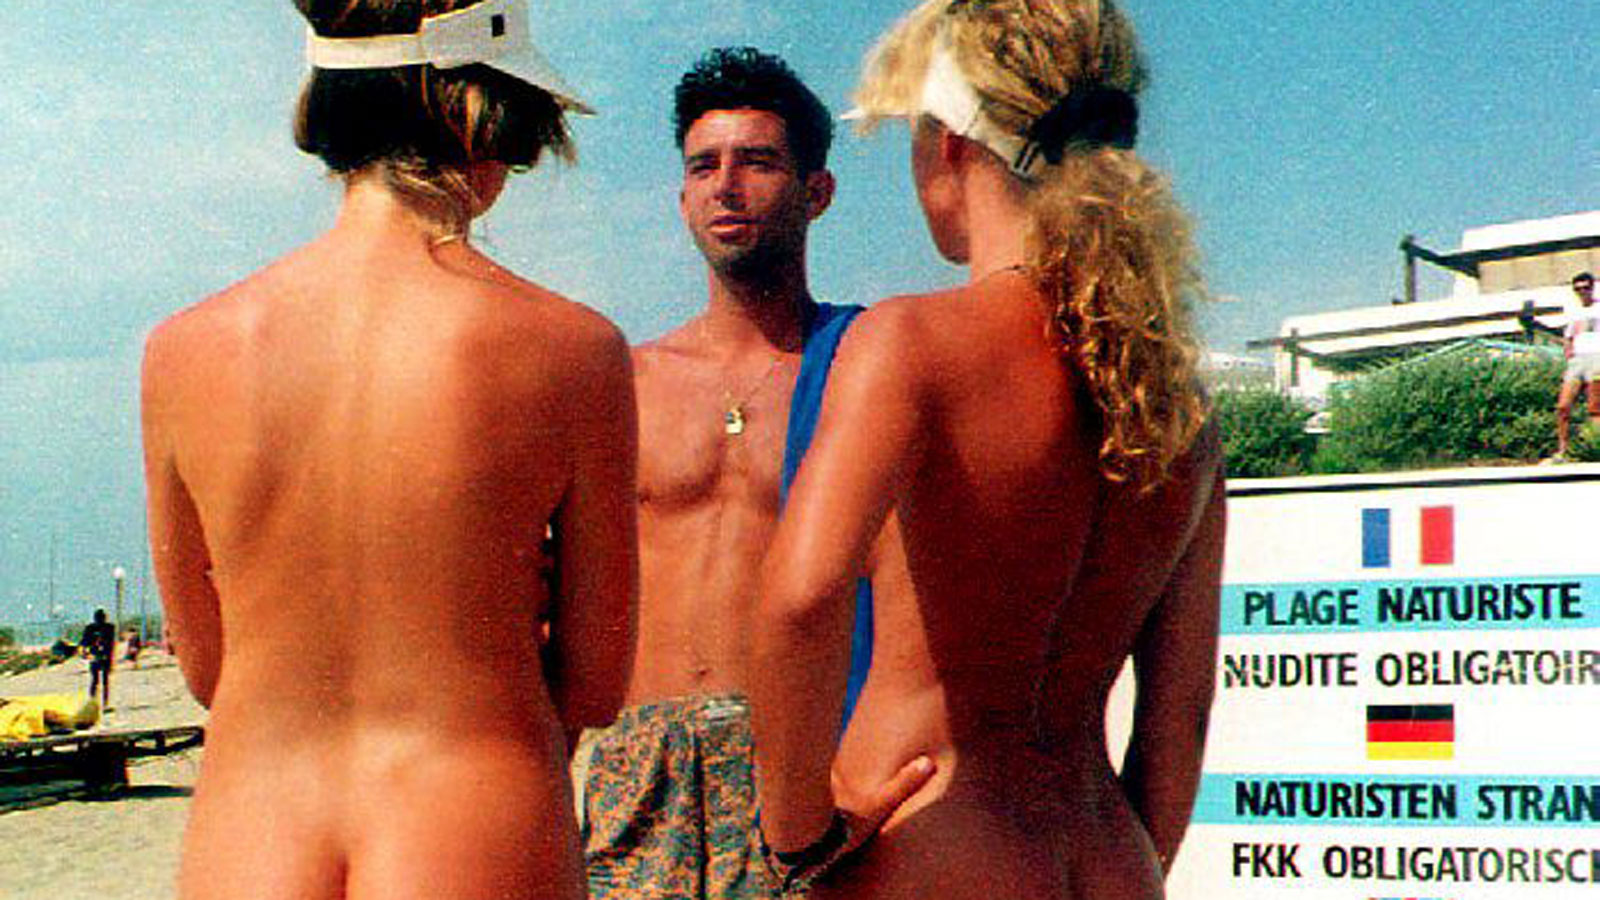 Public girls nude naturist in